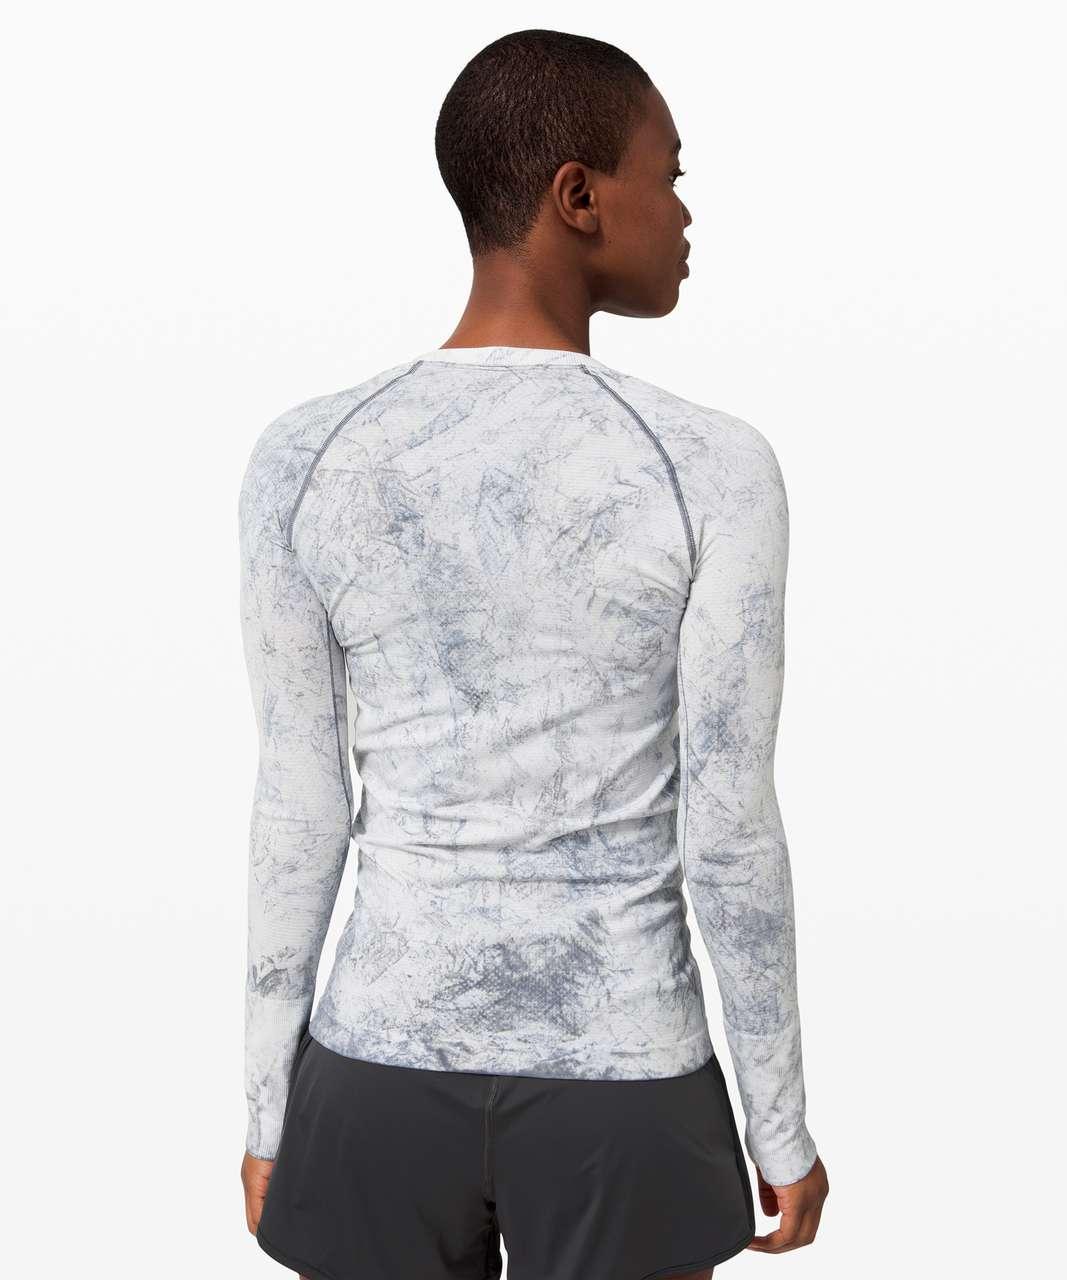 Lululemon Swiftly Tech Long Sleeve 2.0 *MultiDye - Multi Dye White / Grey / Black